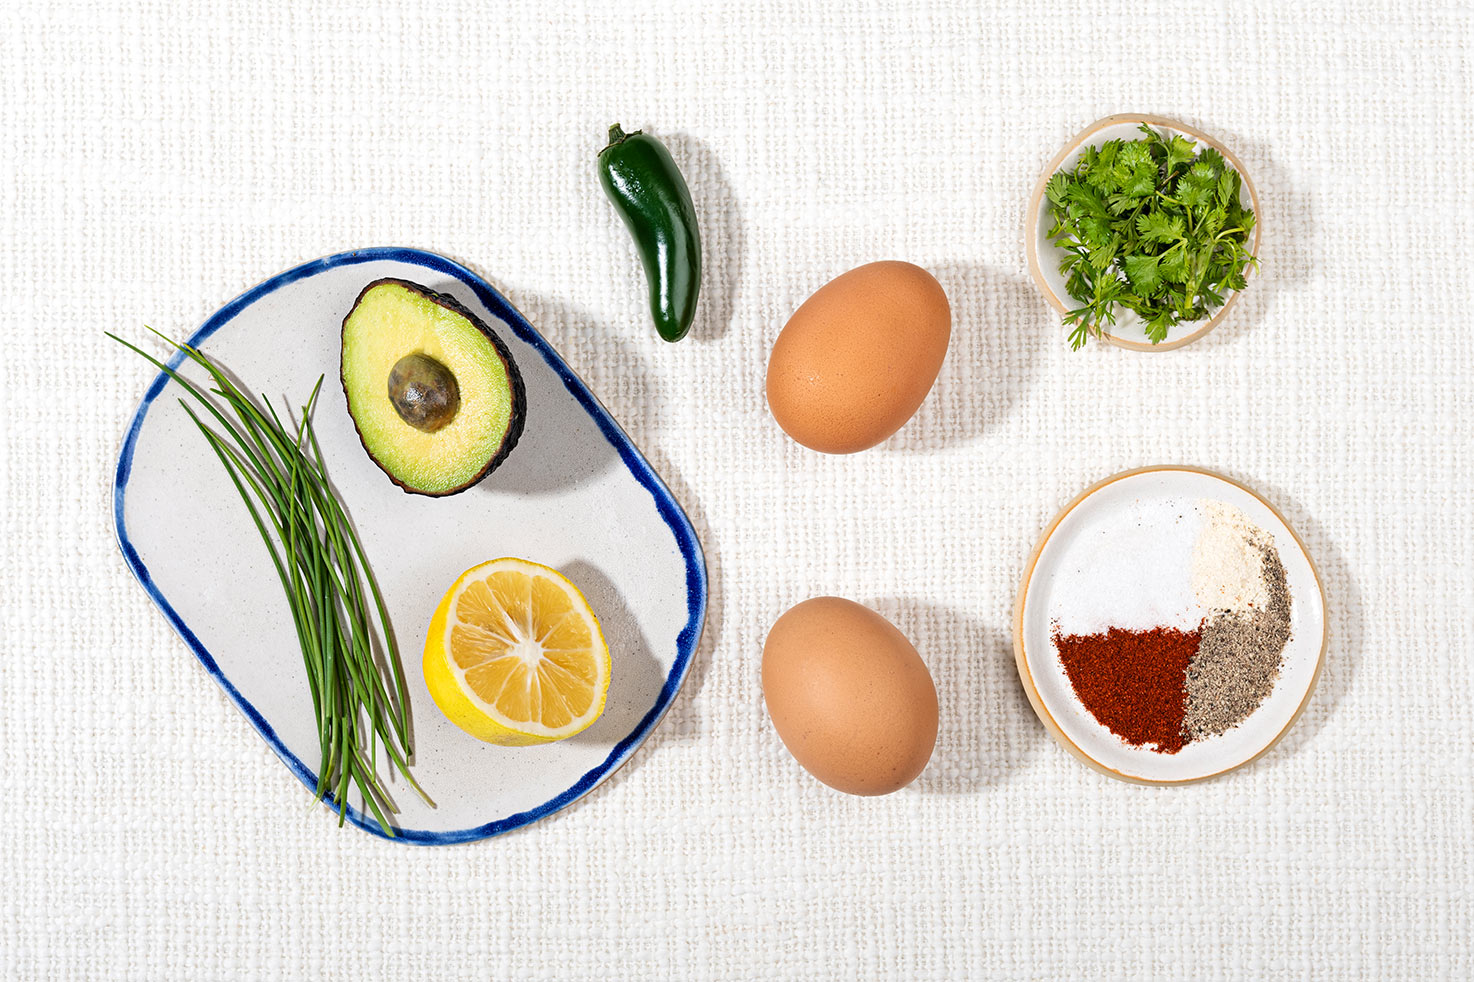 The recipe ingredients like eggs, avocado, lemon, slices, jalapeño, cilantro etc. | Hurry The Food Up